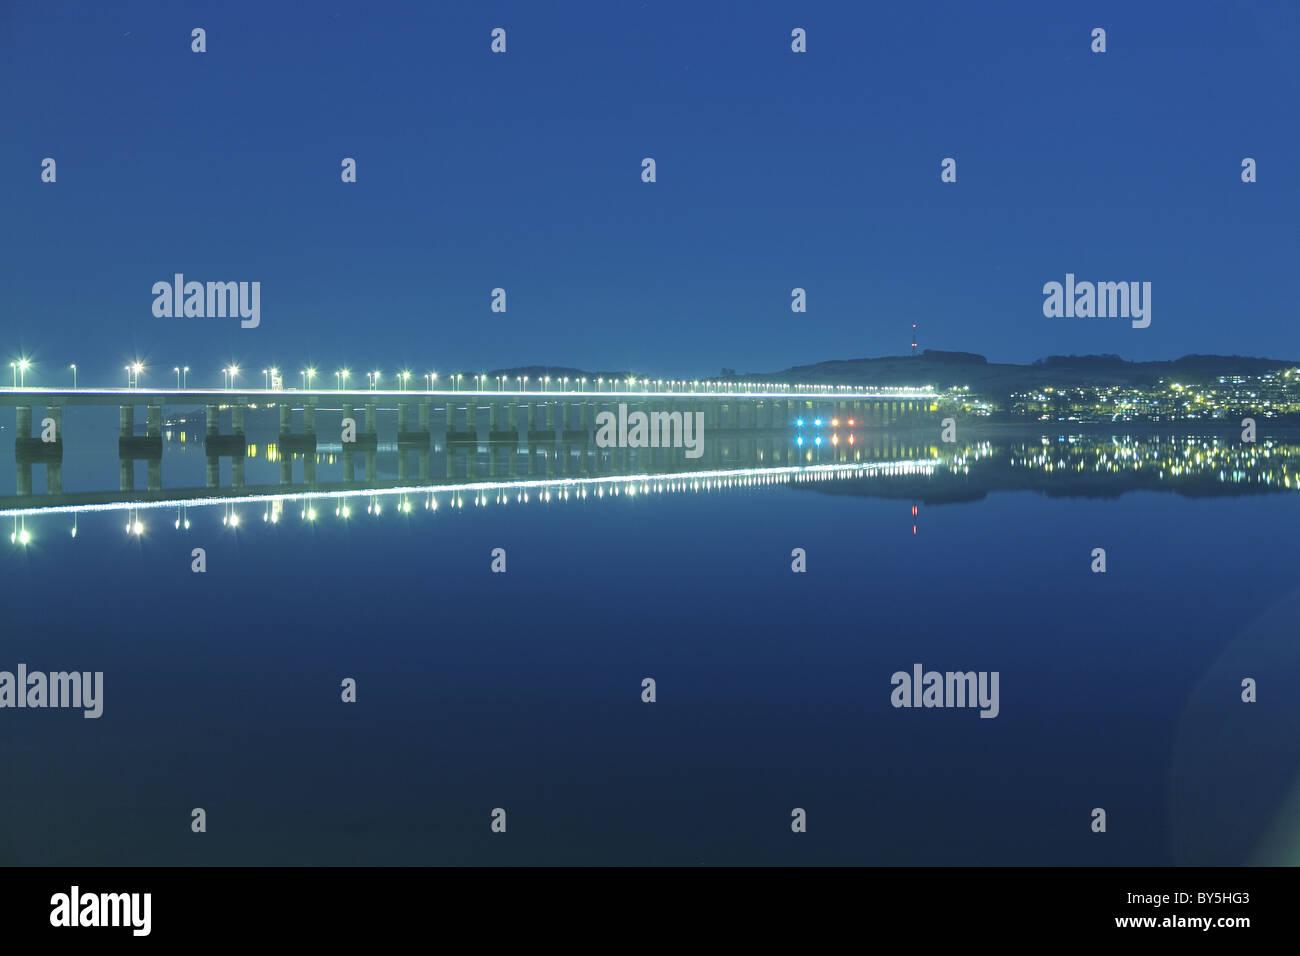 Tay road bridge at night - Stock Image